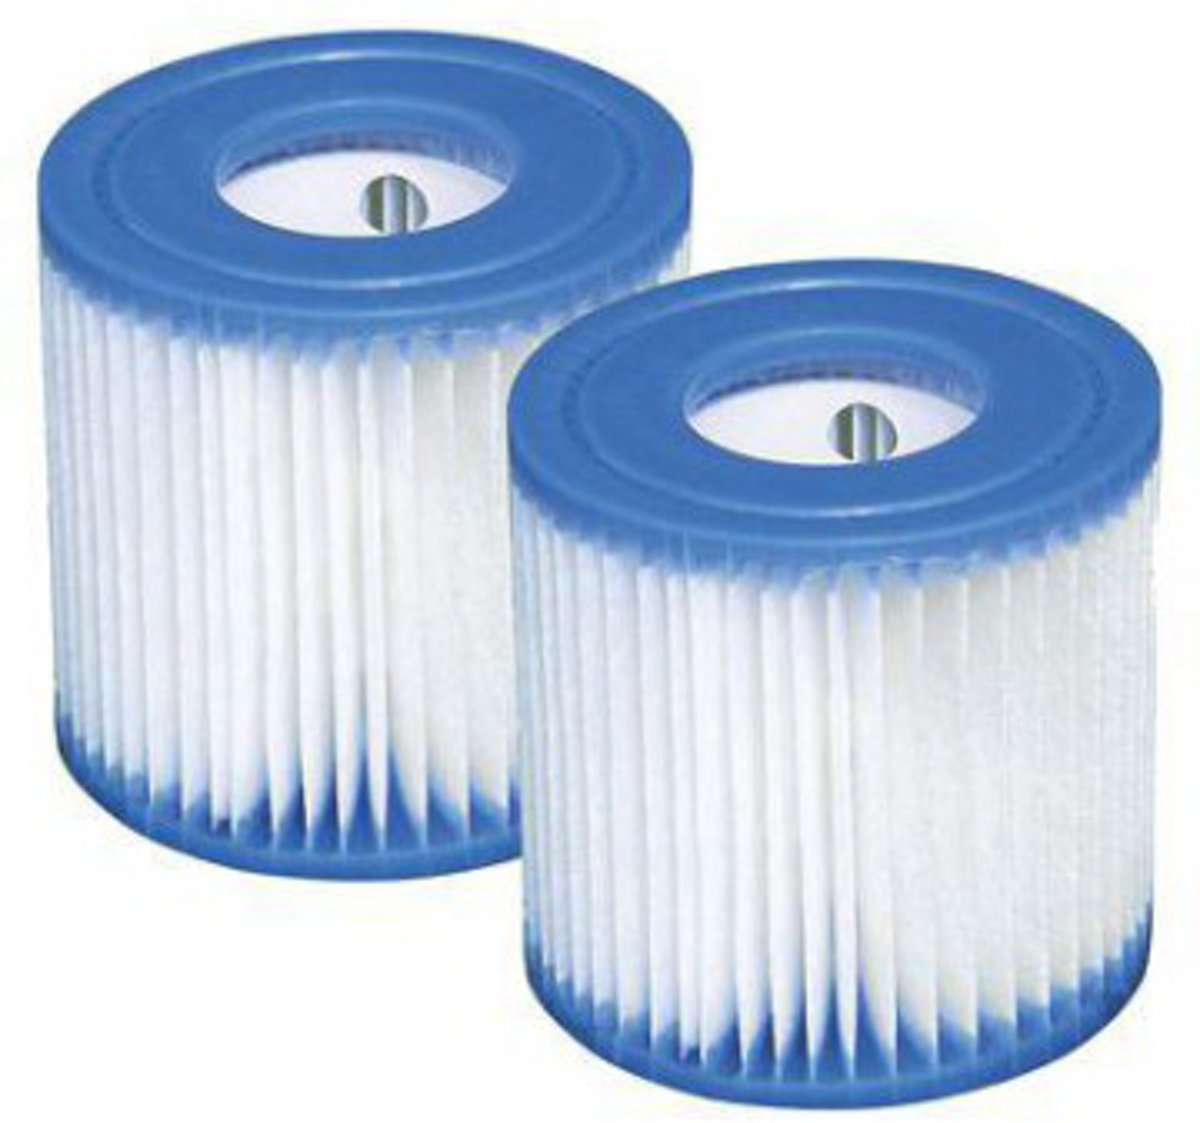 Intex Zwembad Filtercartridge Type H - 29007 -  2 stuks